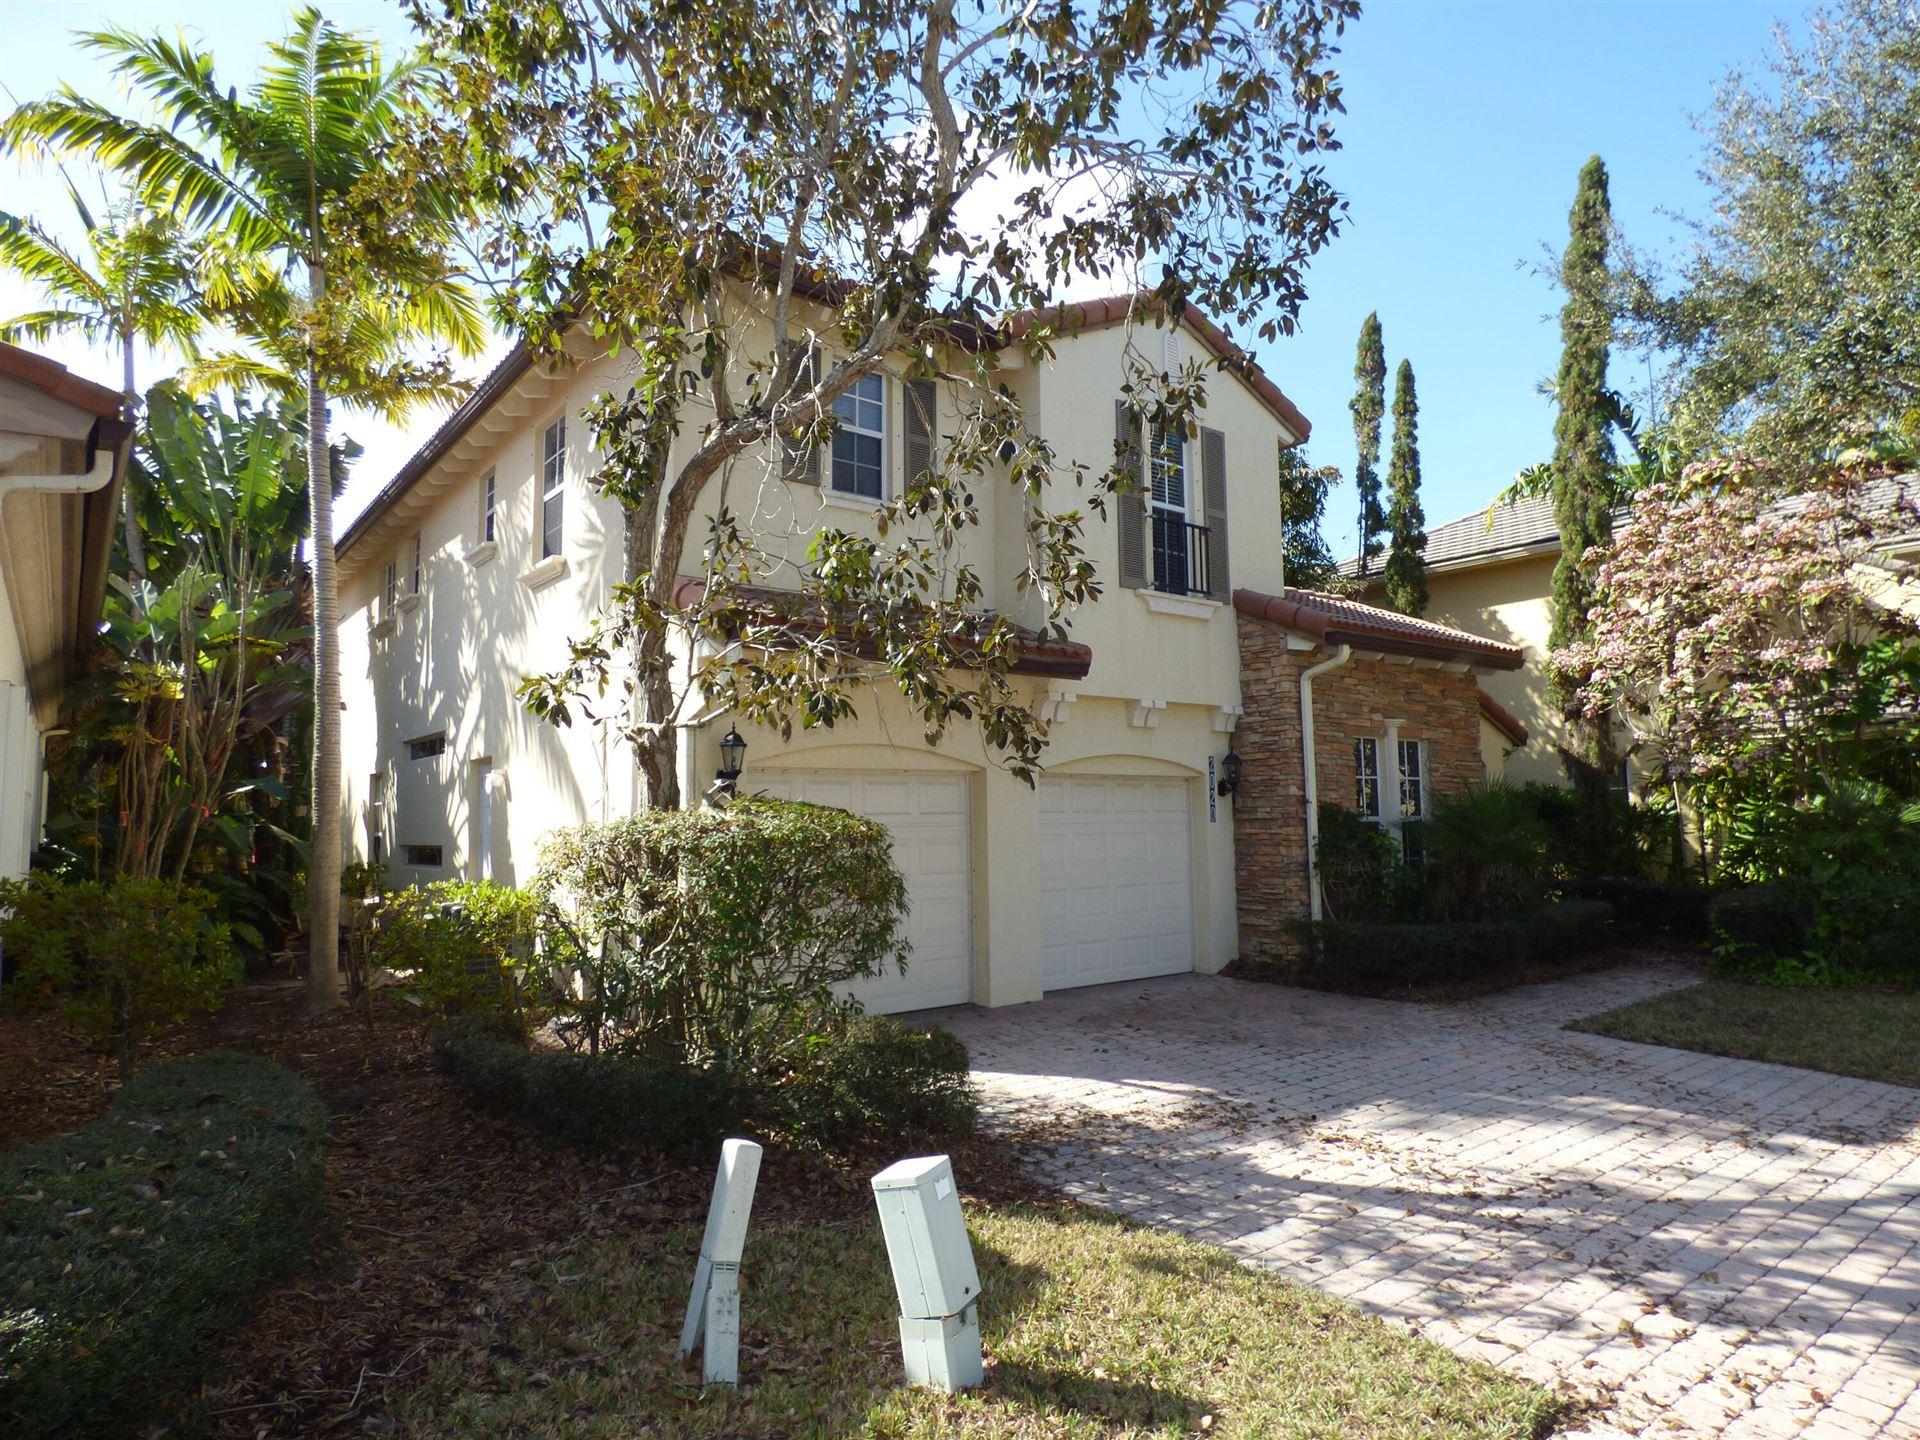 Photo of 2020 Graden Drive, Palm Beach Gardens, FL 33410 (MLS # RX-10691234)